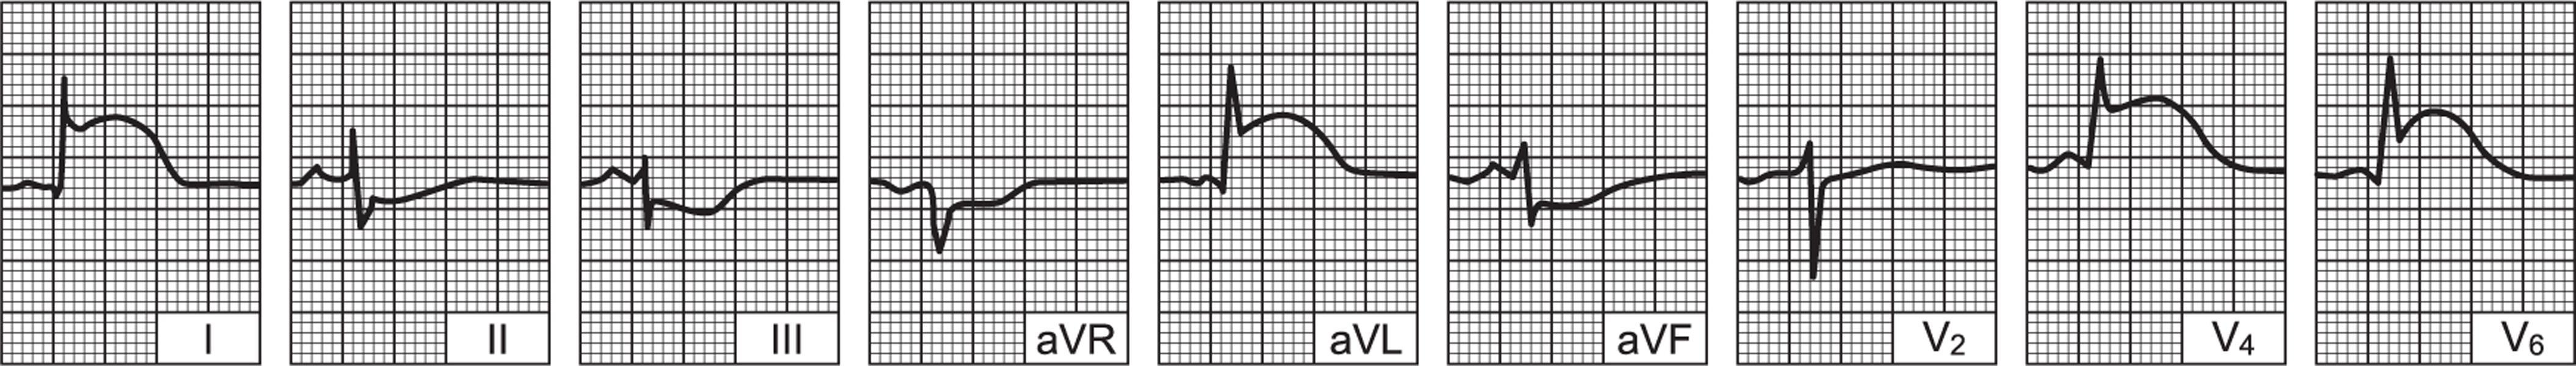 infarkt miokarda prognozom za život